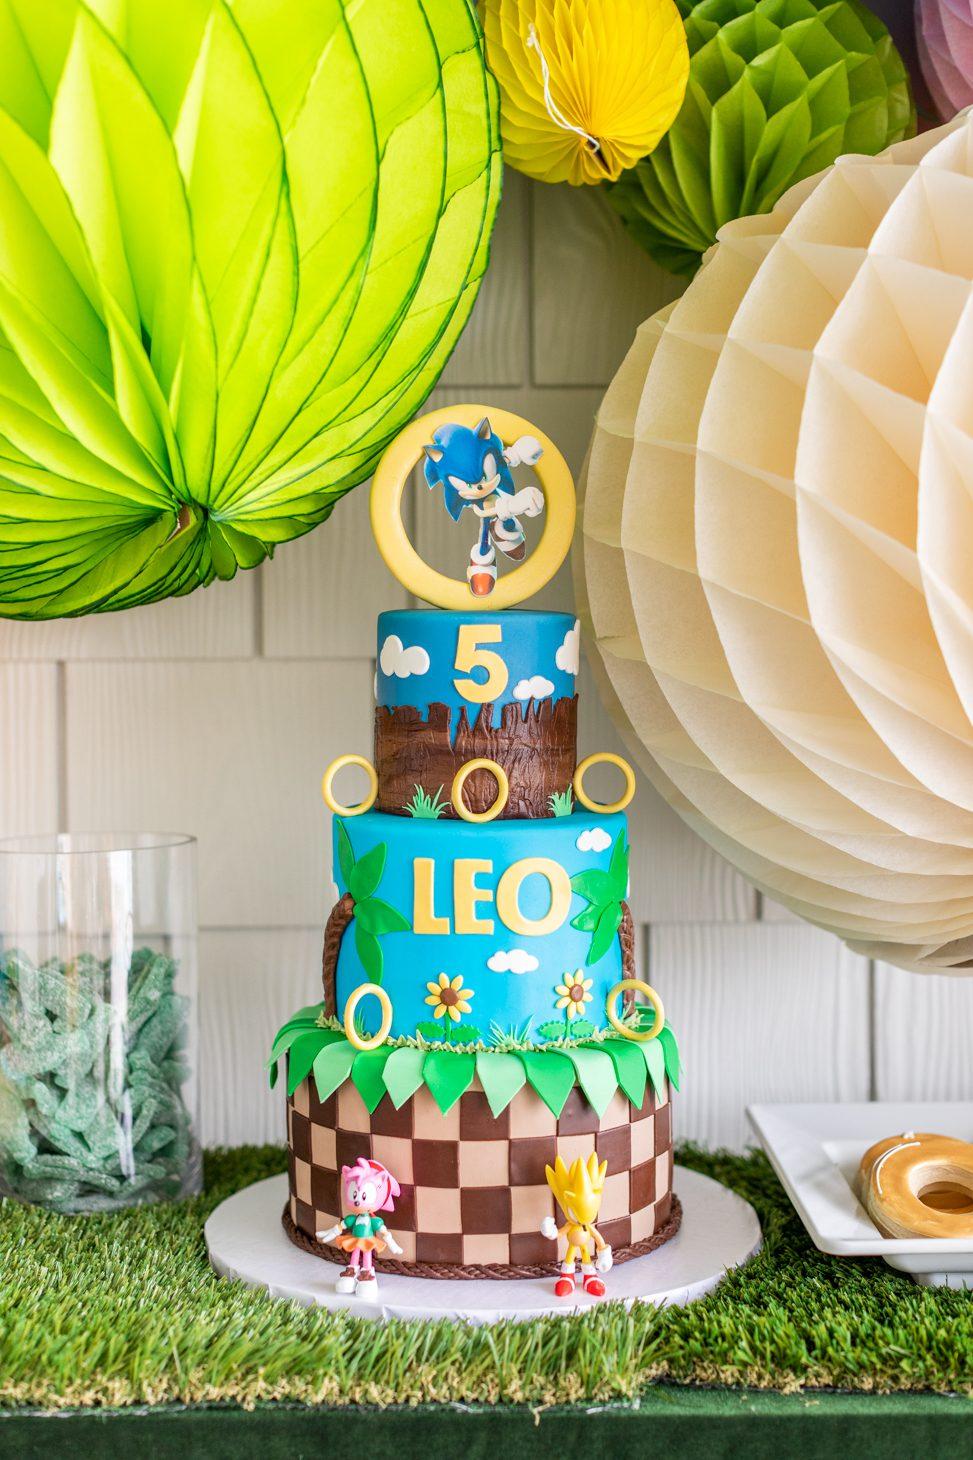 Sonic the Hedgehog themed birthday cake